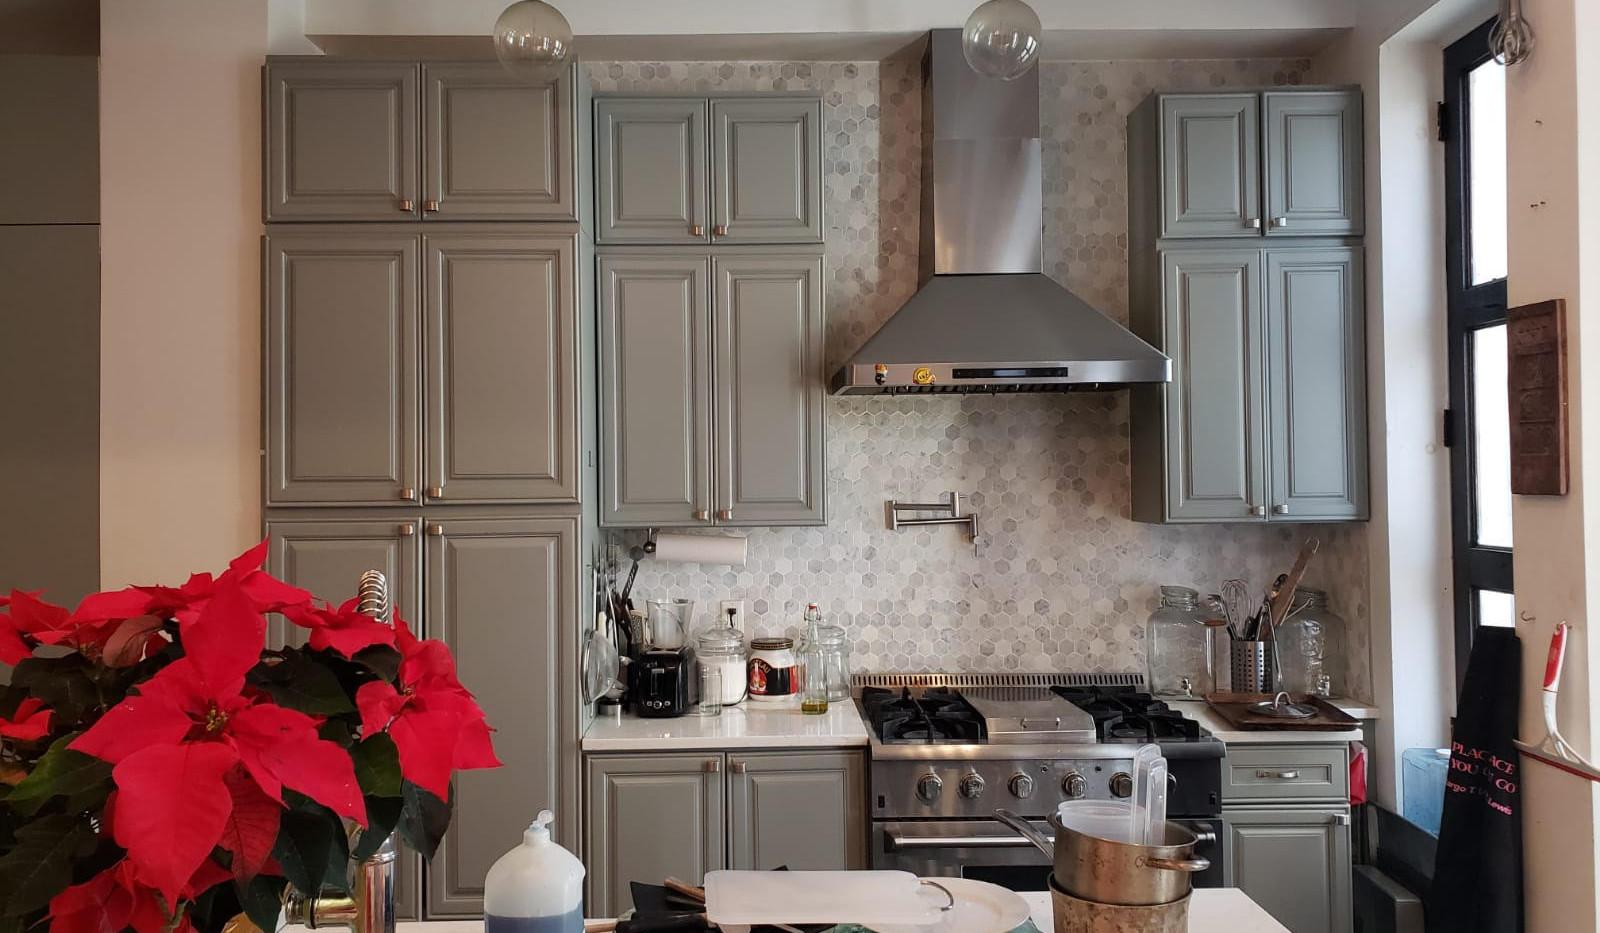 indoor kitchen.jpg